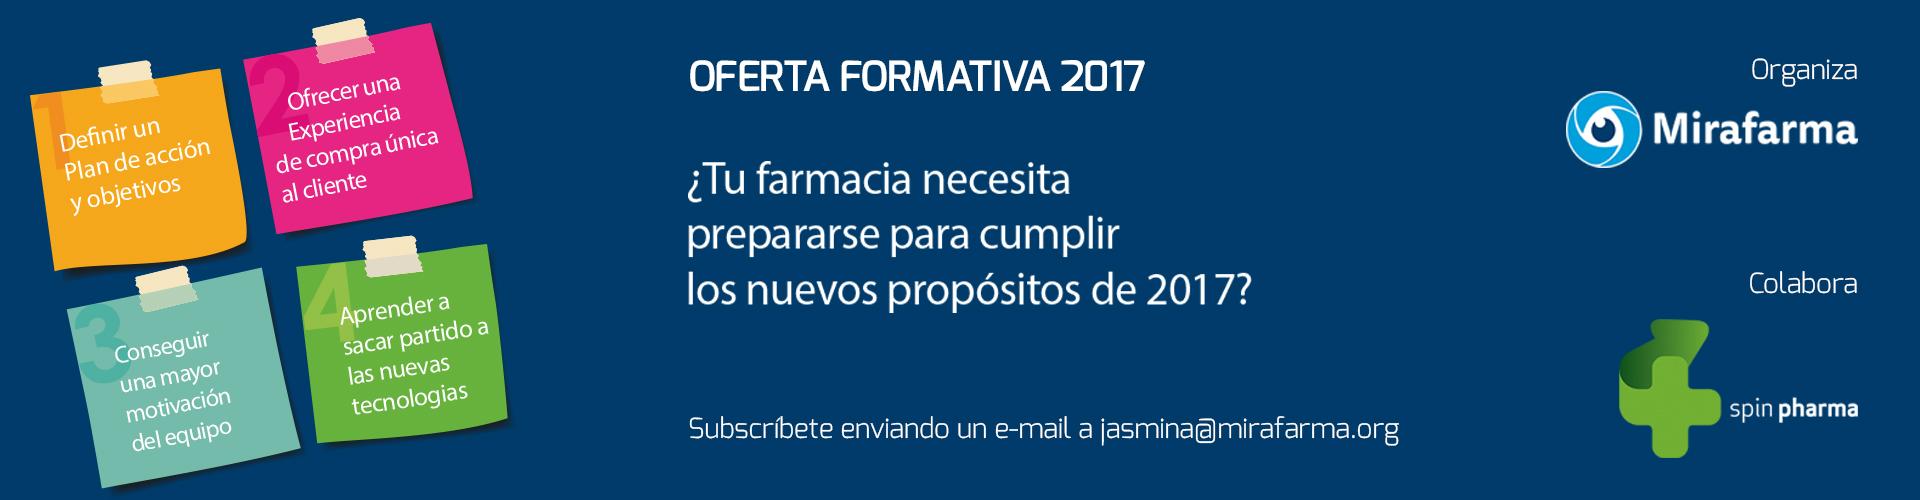 EVENTOS MIRAFARMA & SPINPHARMA 2017